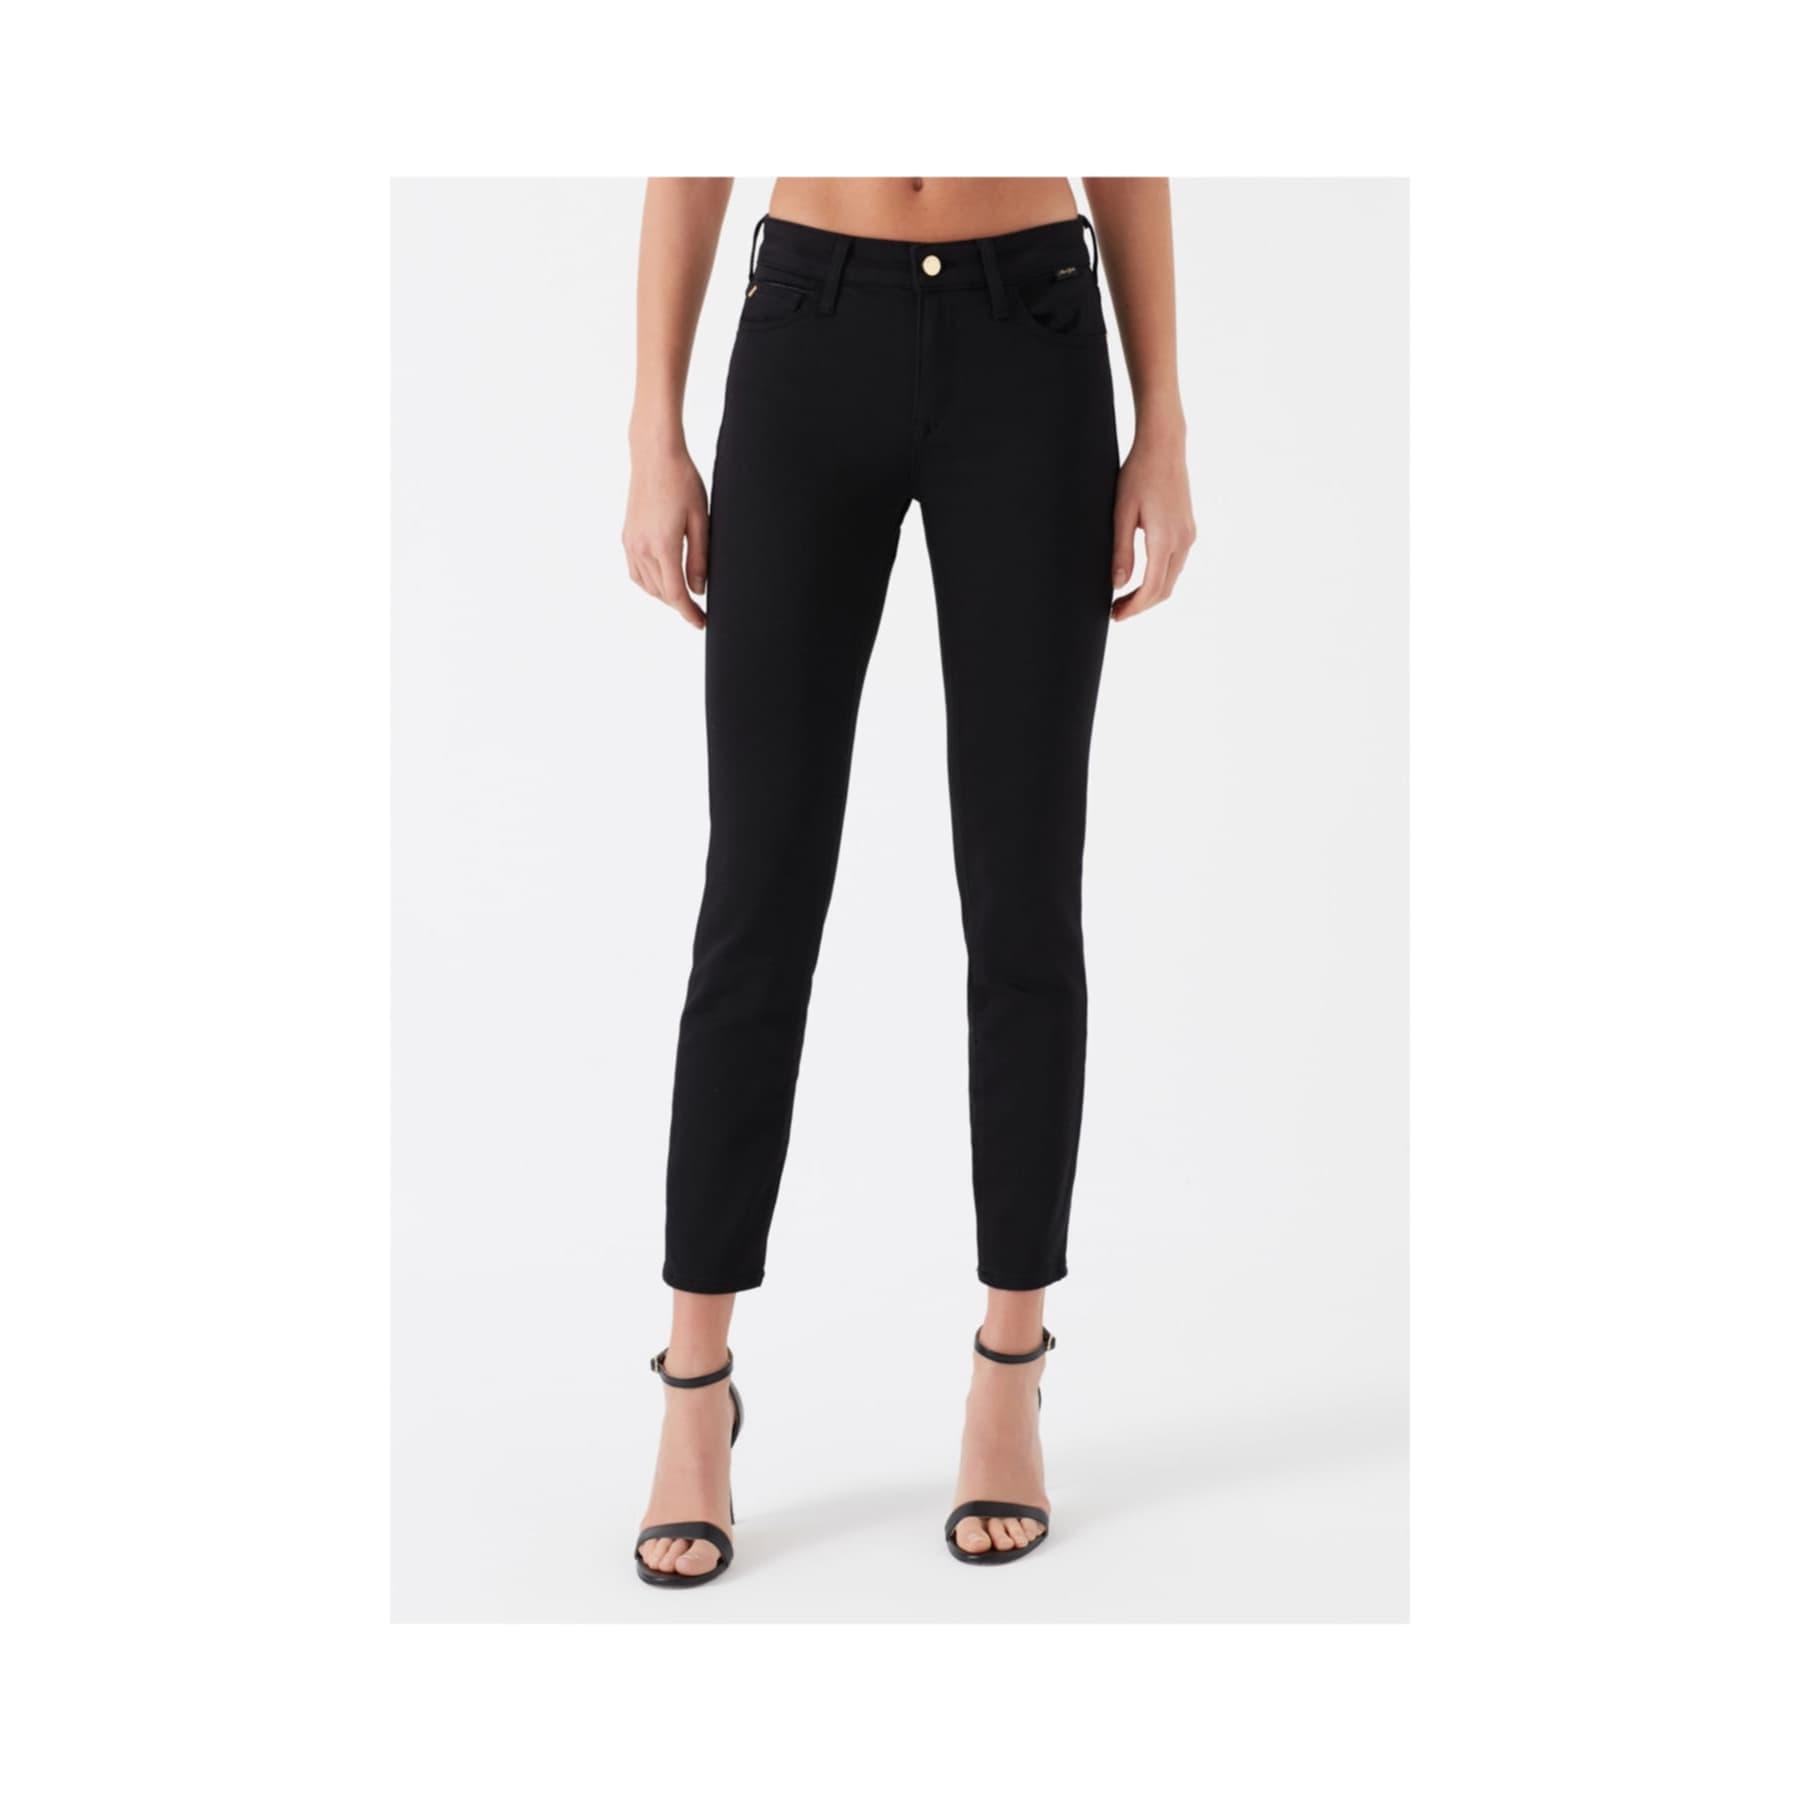 Adriana Ankle Golden Gold Siyah Jean Pantolon